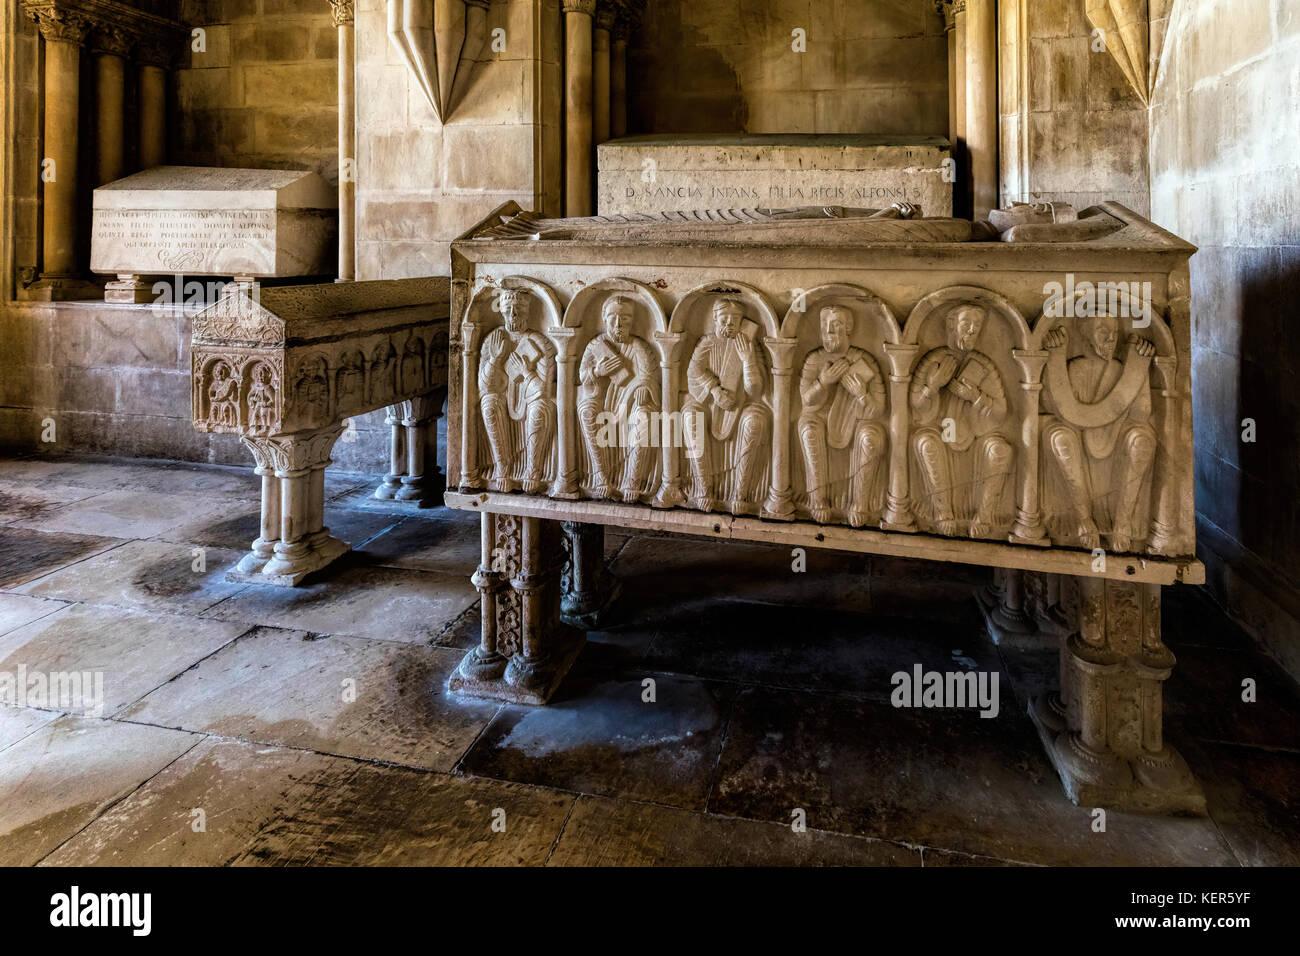 13th century Romanesque tomb of the Queen of Portugal, Urraca of Castile - Stock Image